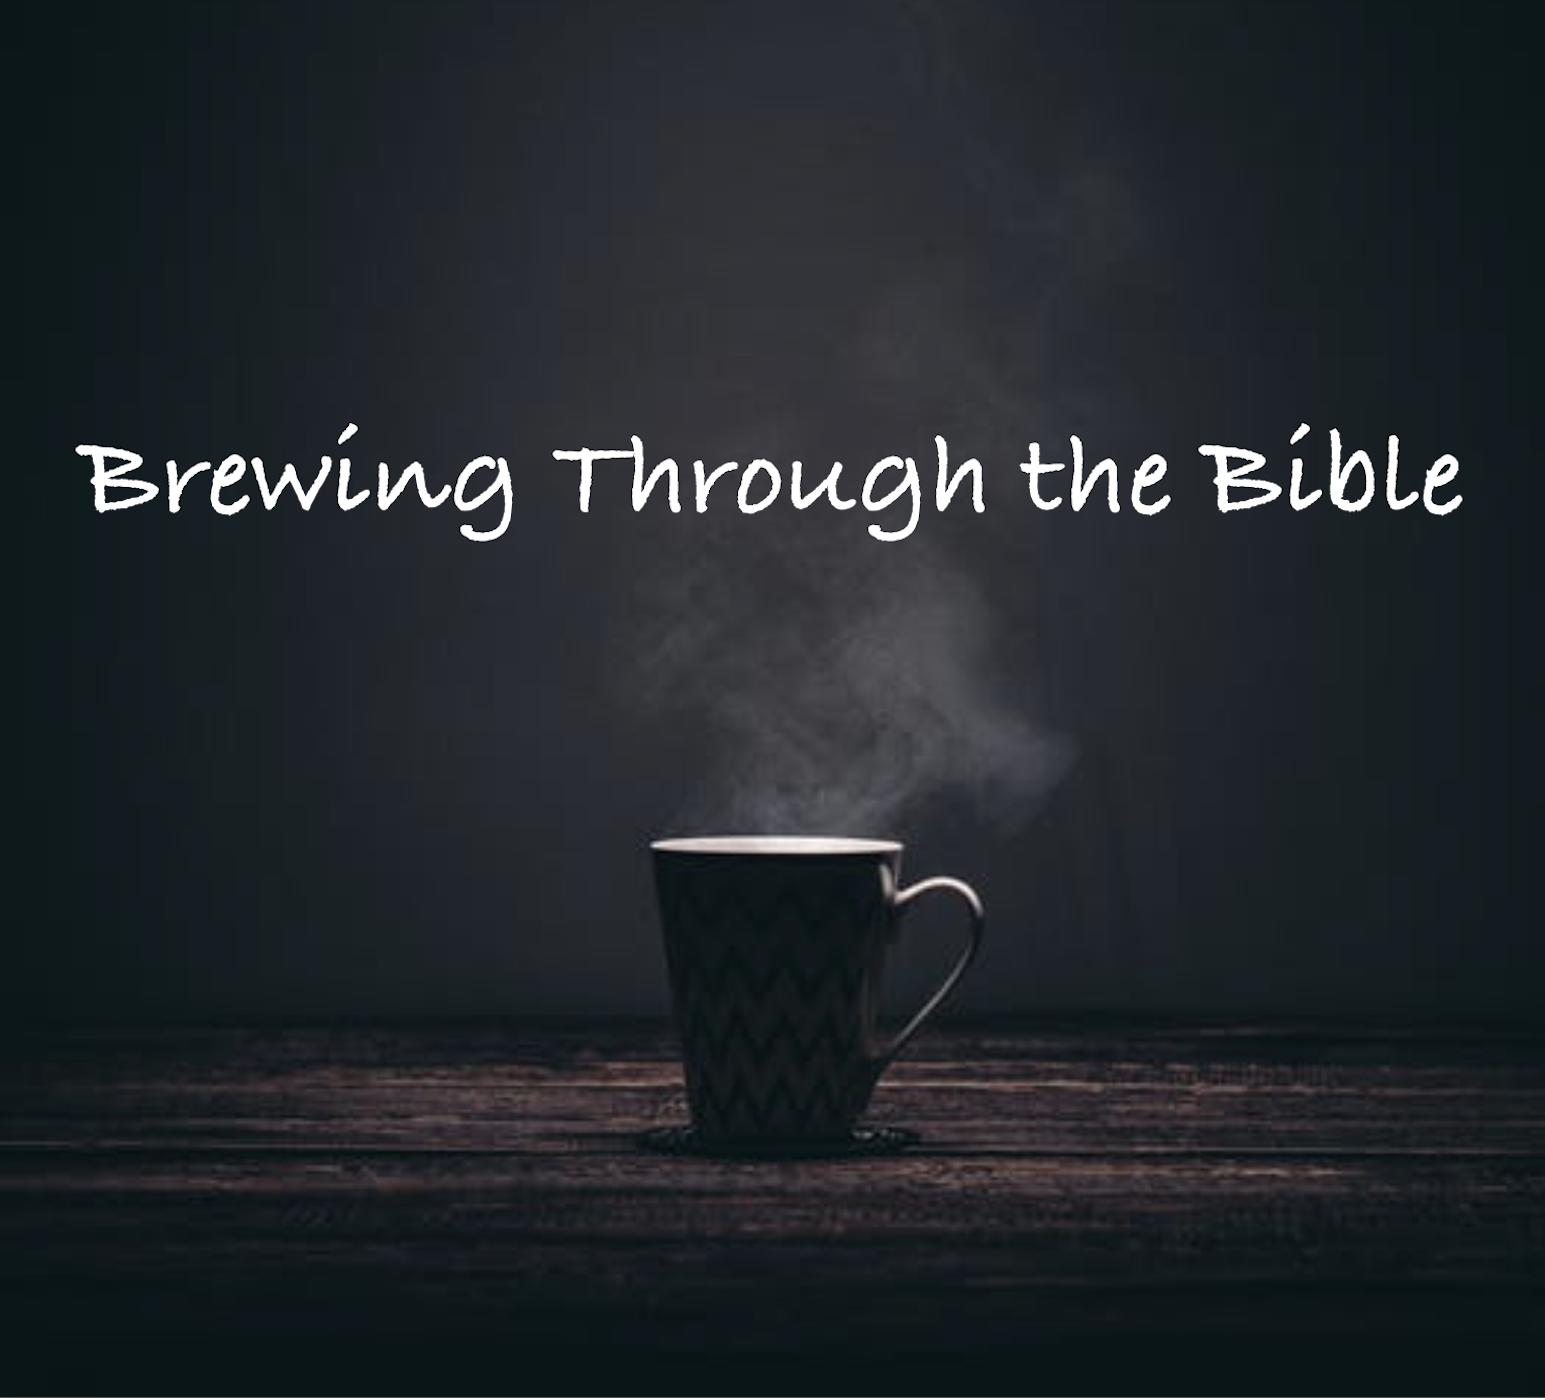 Brewing Through the Bible